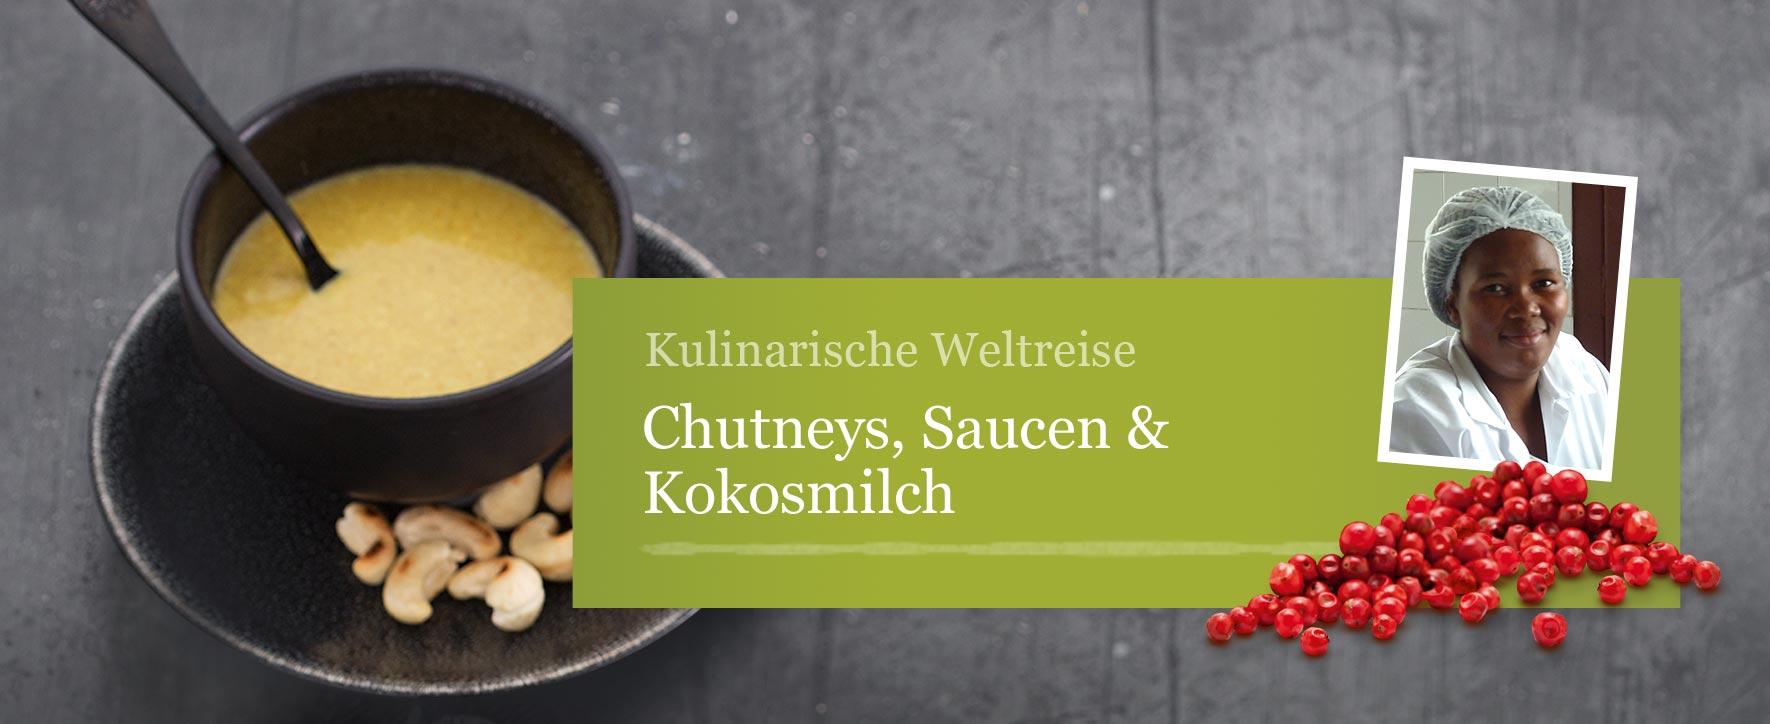 Chutneys, Saucen & Kokosmilch - Foto: GEPA - The Fair Trade Company / Sandra Eckhardt Fotografie